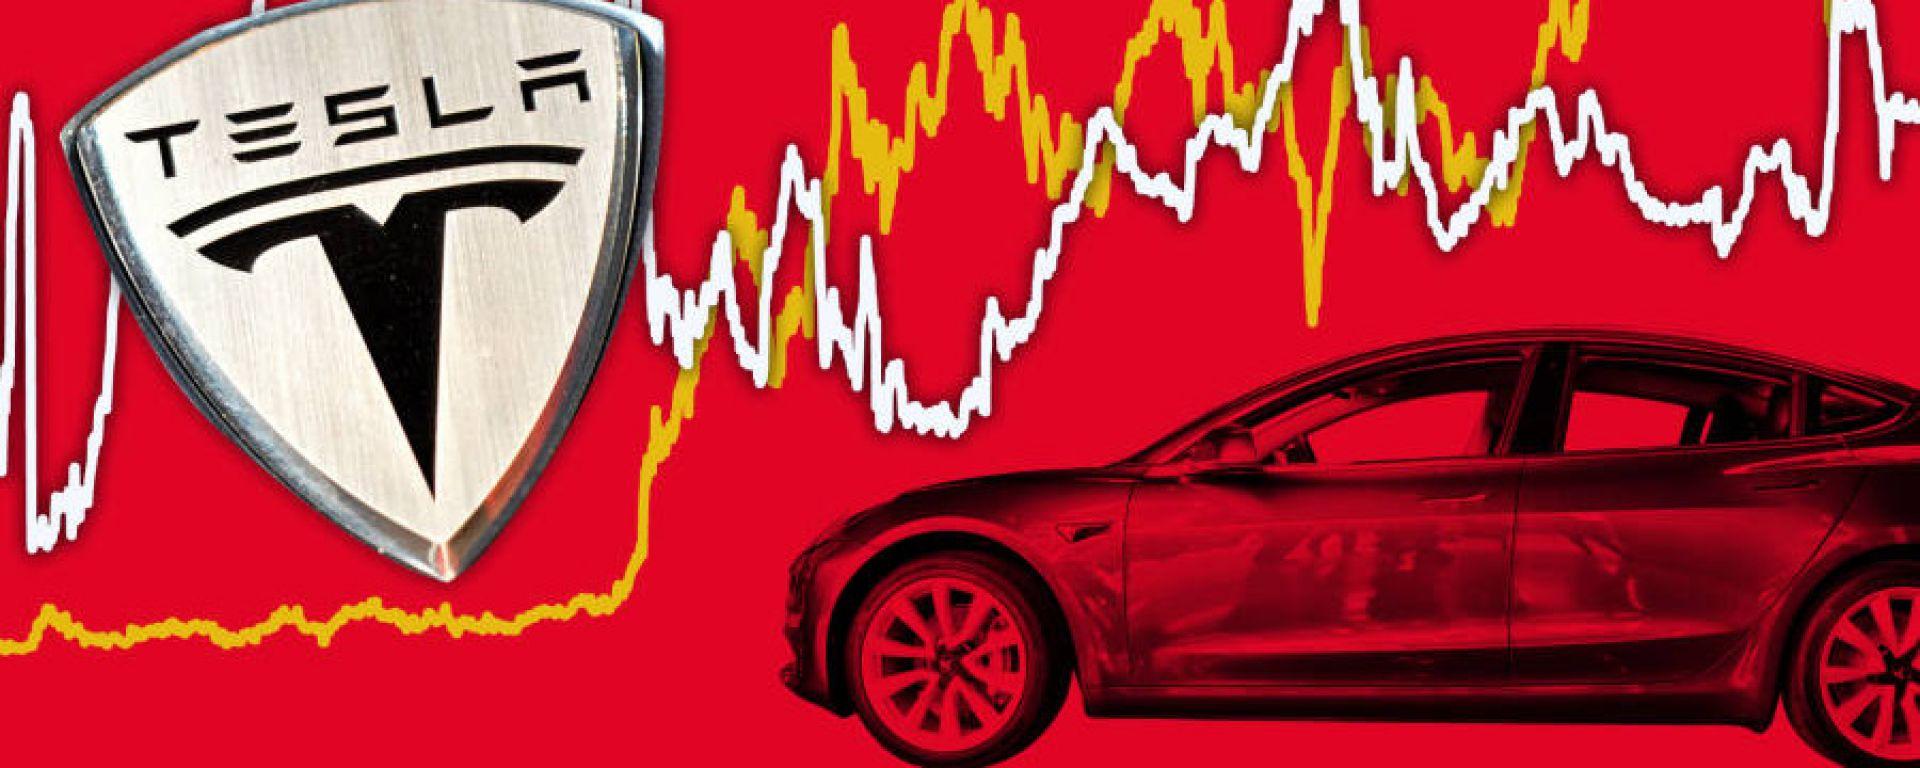 Tesla crolla a Wall Street: le ragioni dietro al tonfo